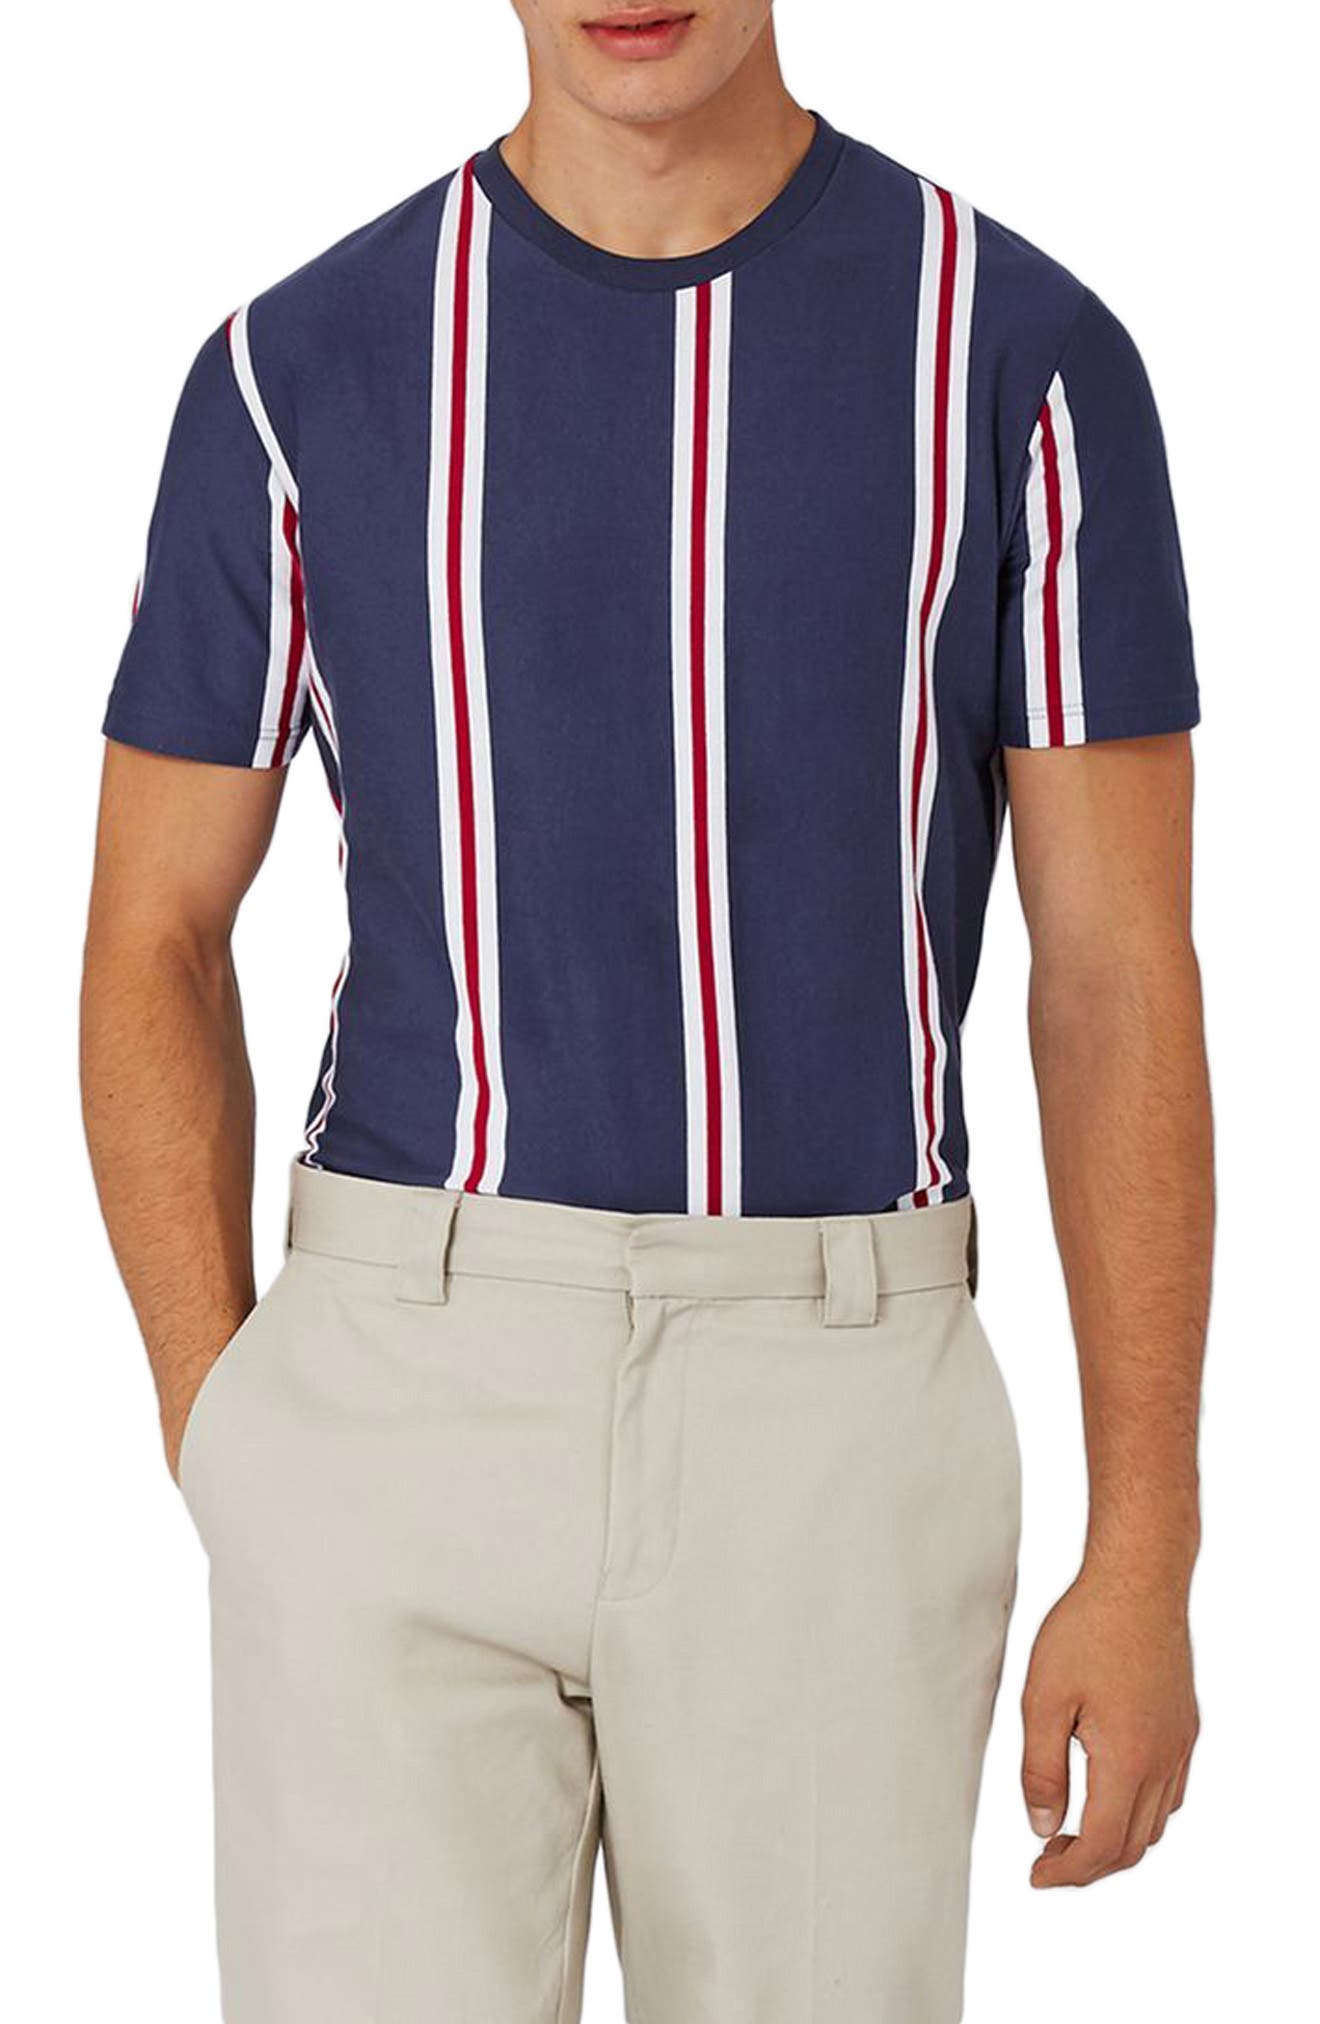 Topman Hector Stripe T-Shirt